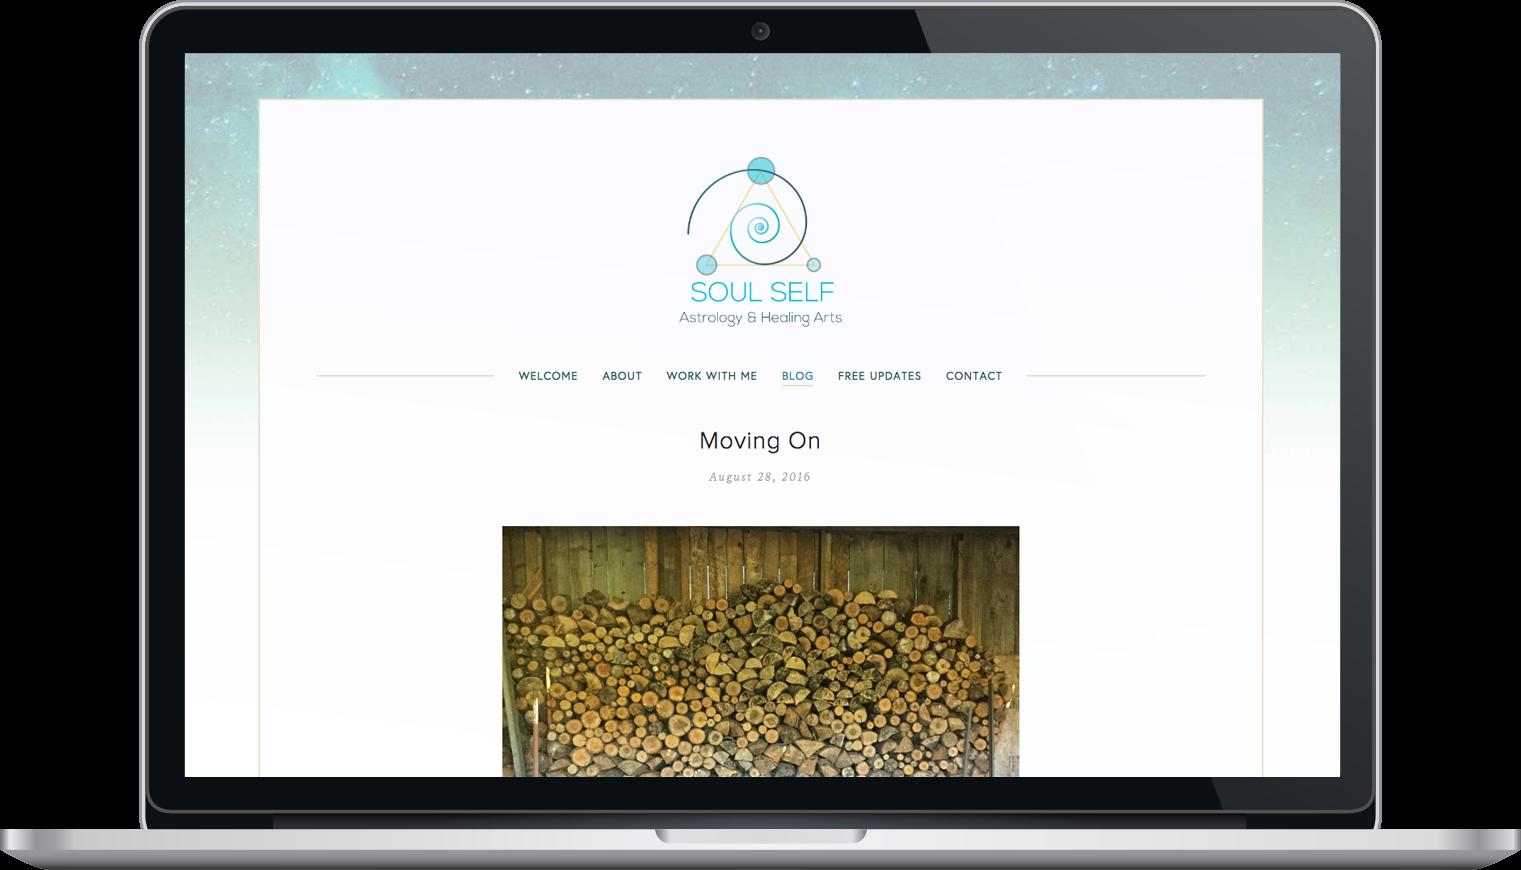 soul-self-site-blog-1.png